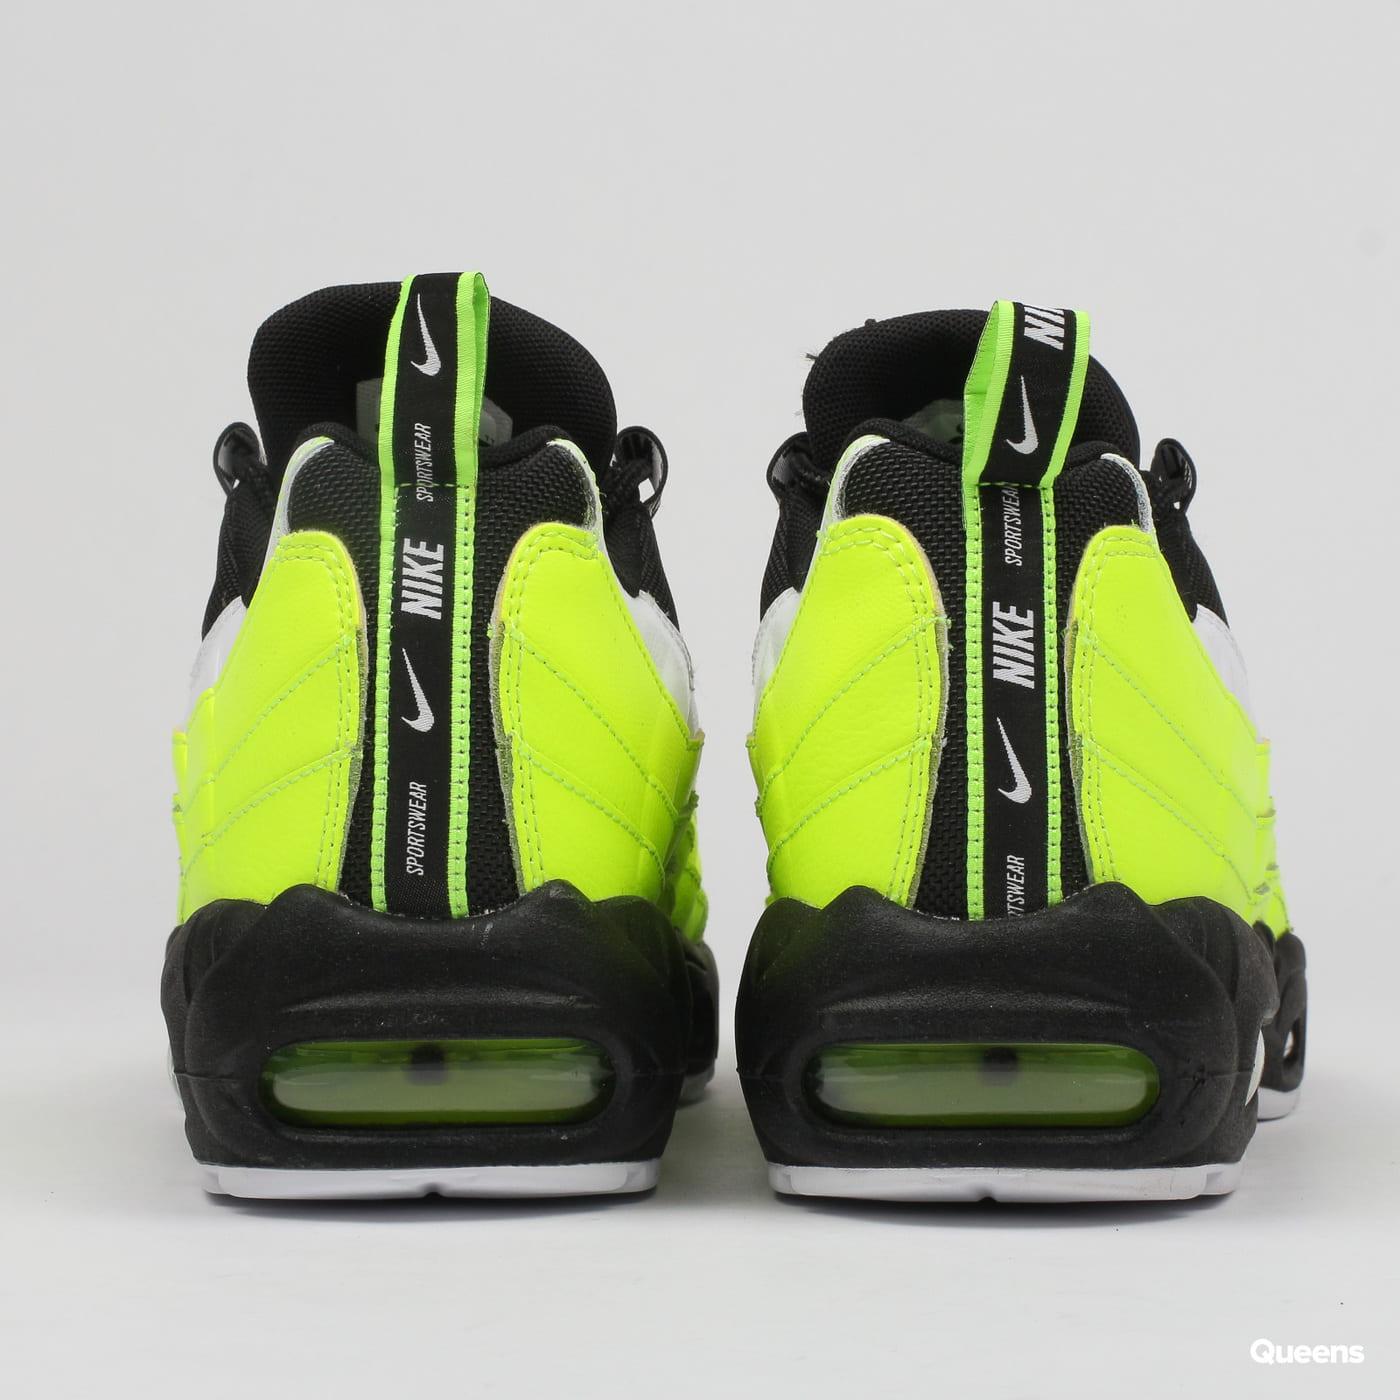 online store db178 810a5 Zoom in Zoom in Zoom in Zoom in Zoom in. Nike Air Max 95 Premium volt    black - volt glow